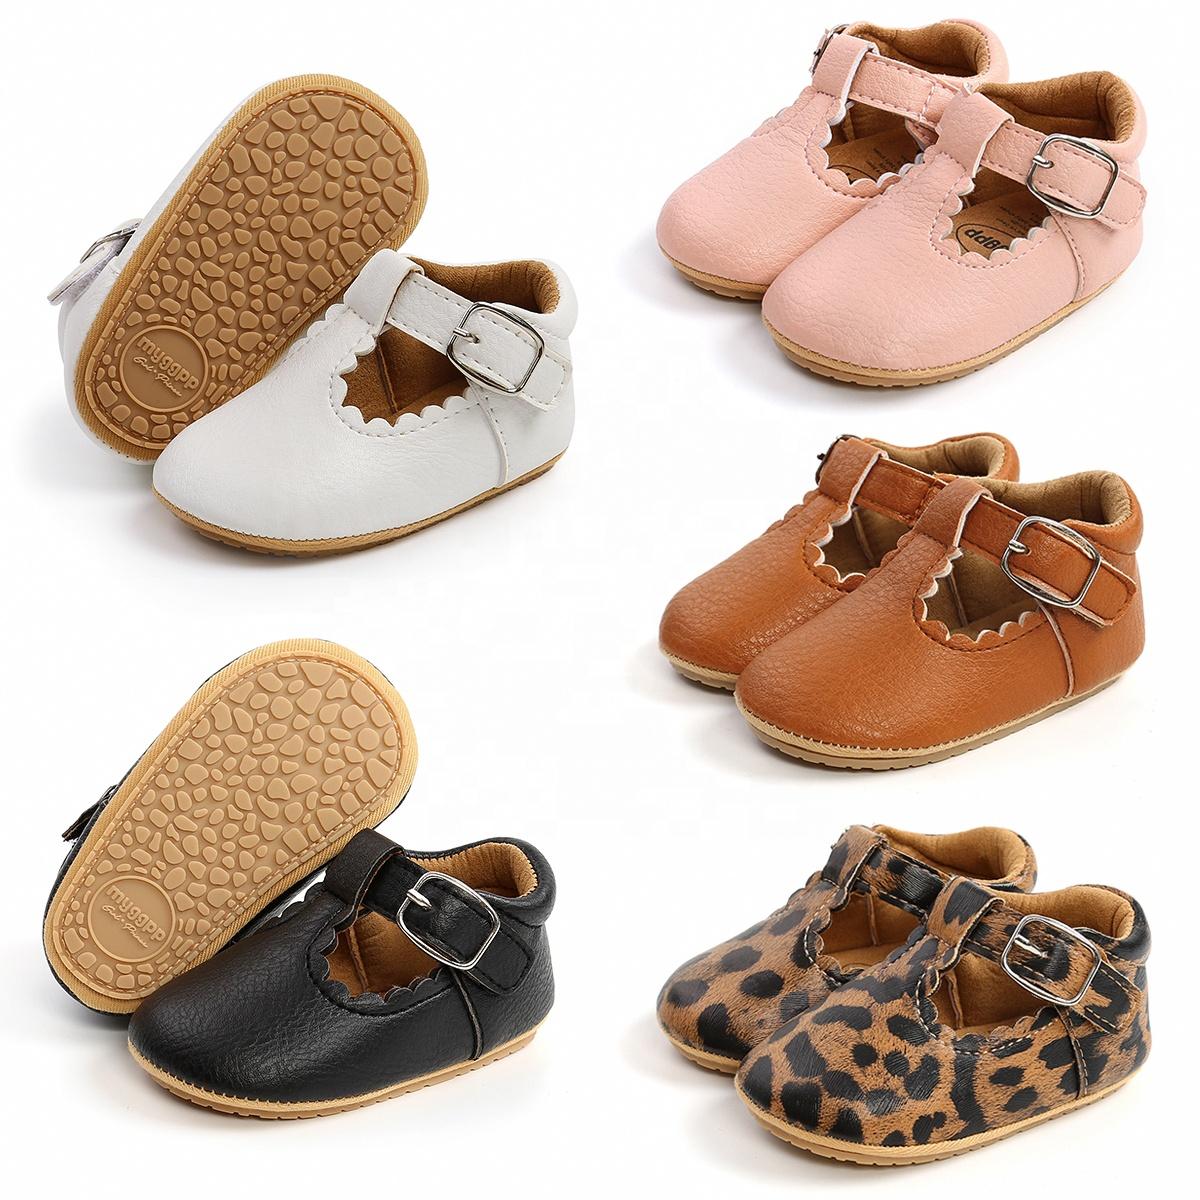 2020 New fashion Rubber Sole T-Bar newborn prewalker Anti-slip toddler baby girl shoes